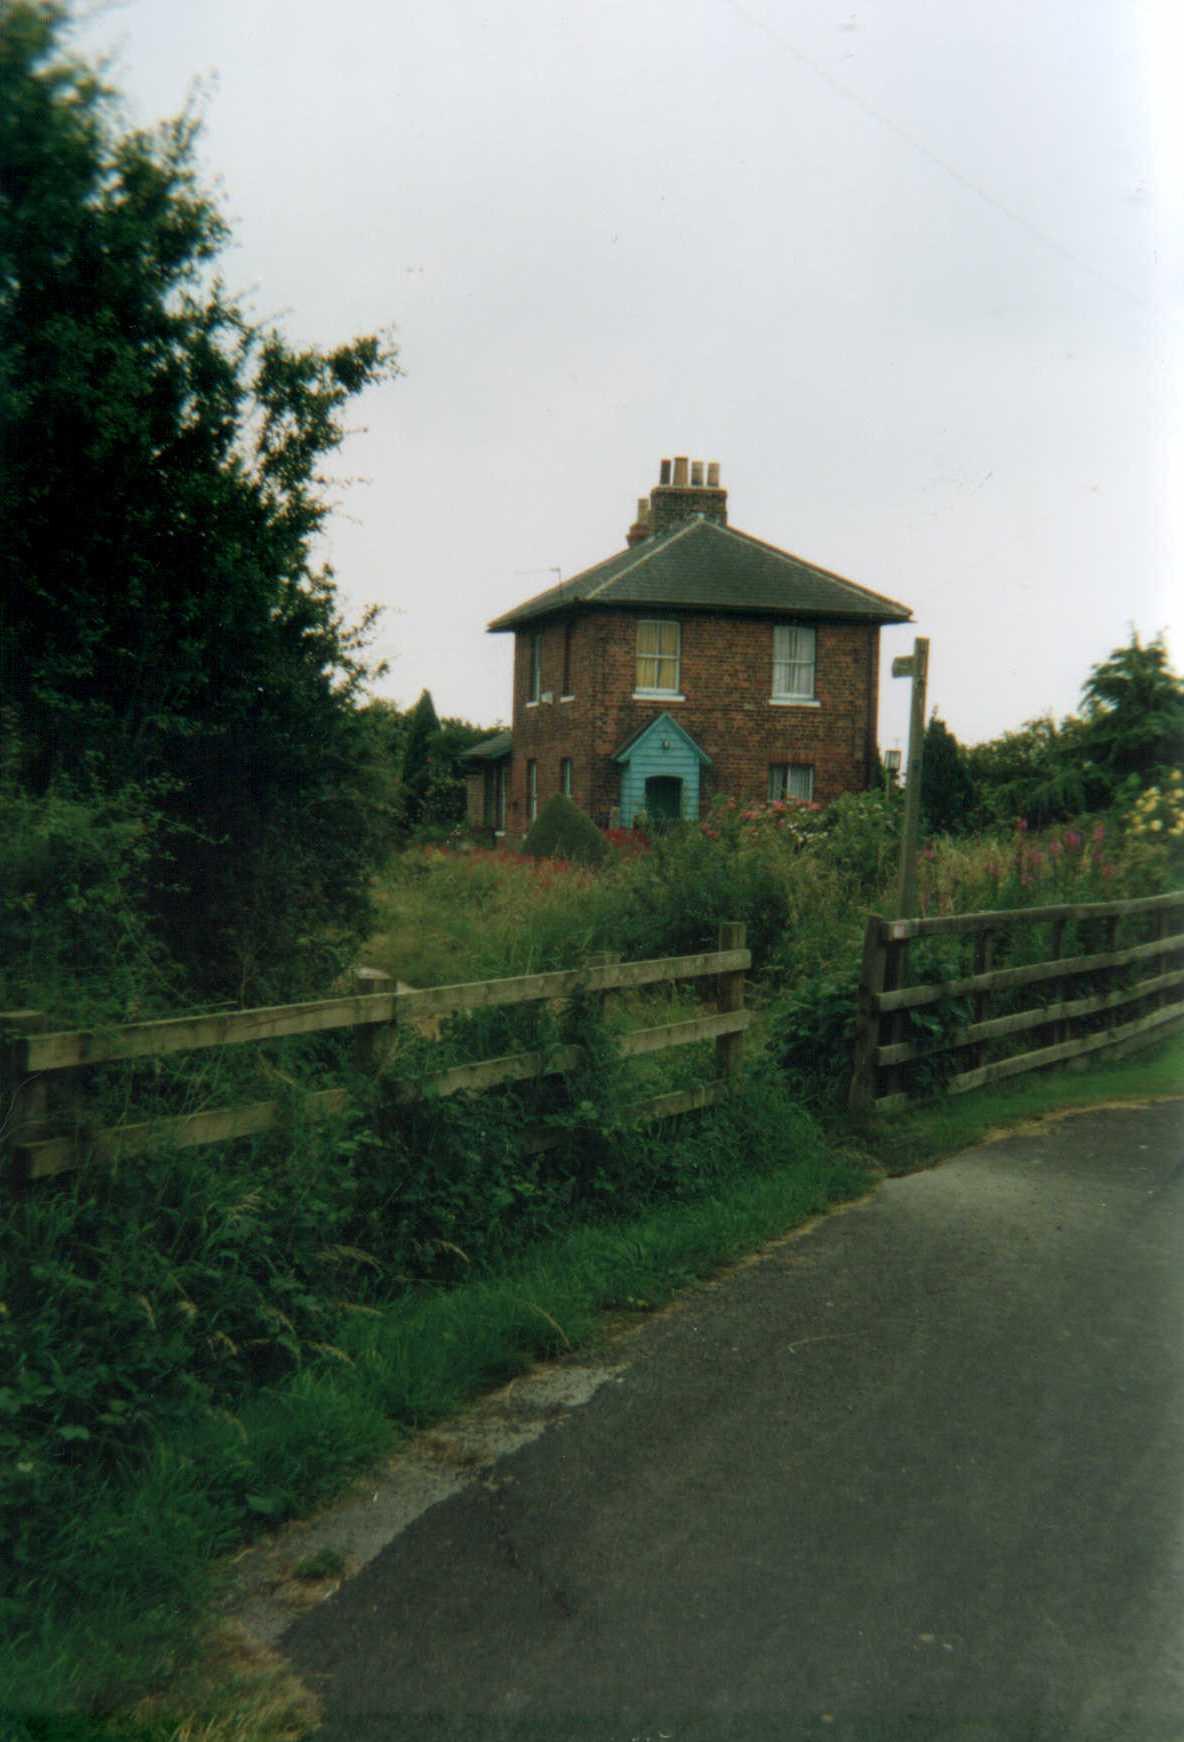 Ellerby Railway Station Wikipedia